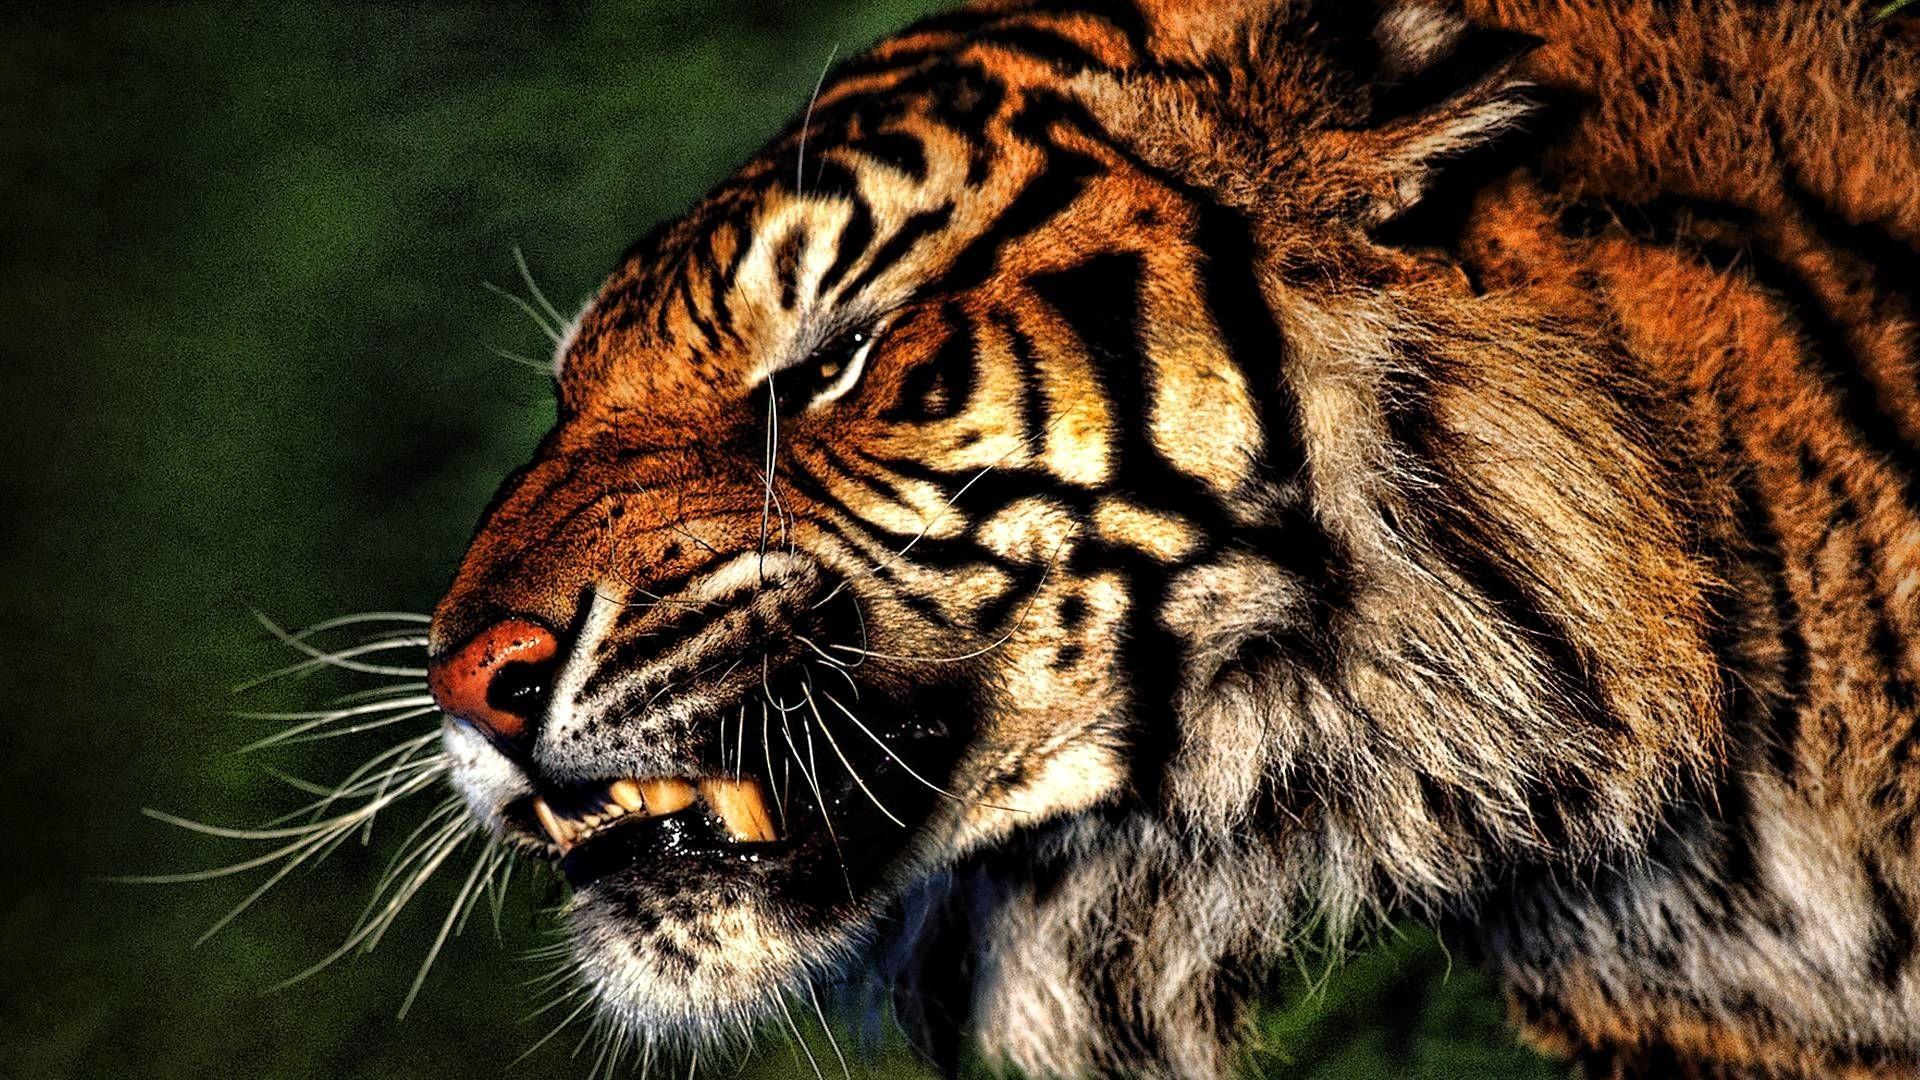 1920x1080 Tiger Wallpaper Hd 1920a 1080 Tiger Wallpapers Tiger Animal Wallpaper Hd 1920x1080 Wallpaper Teahub Io